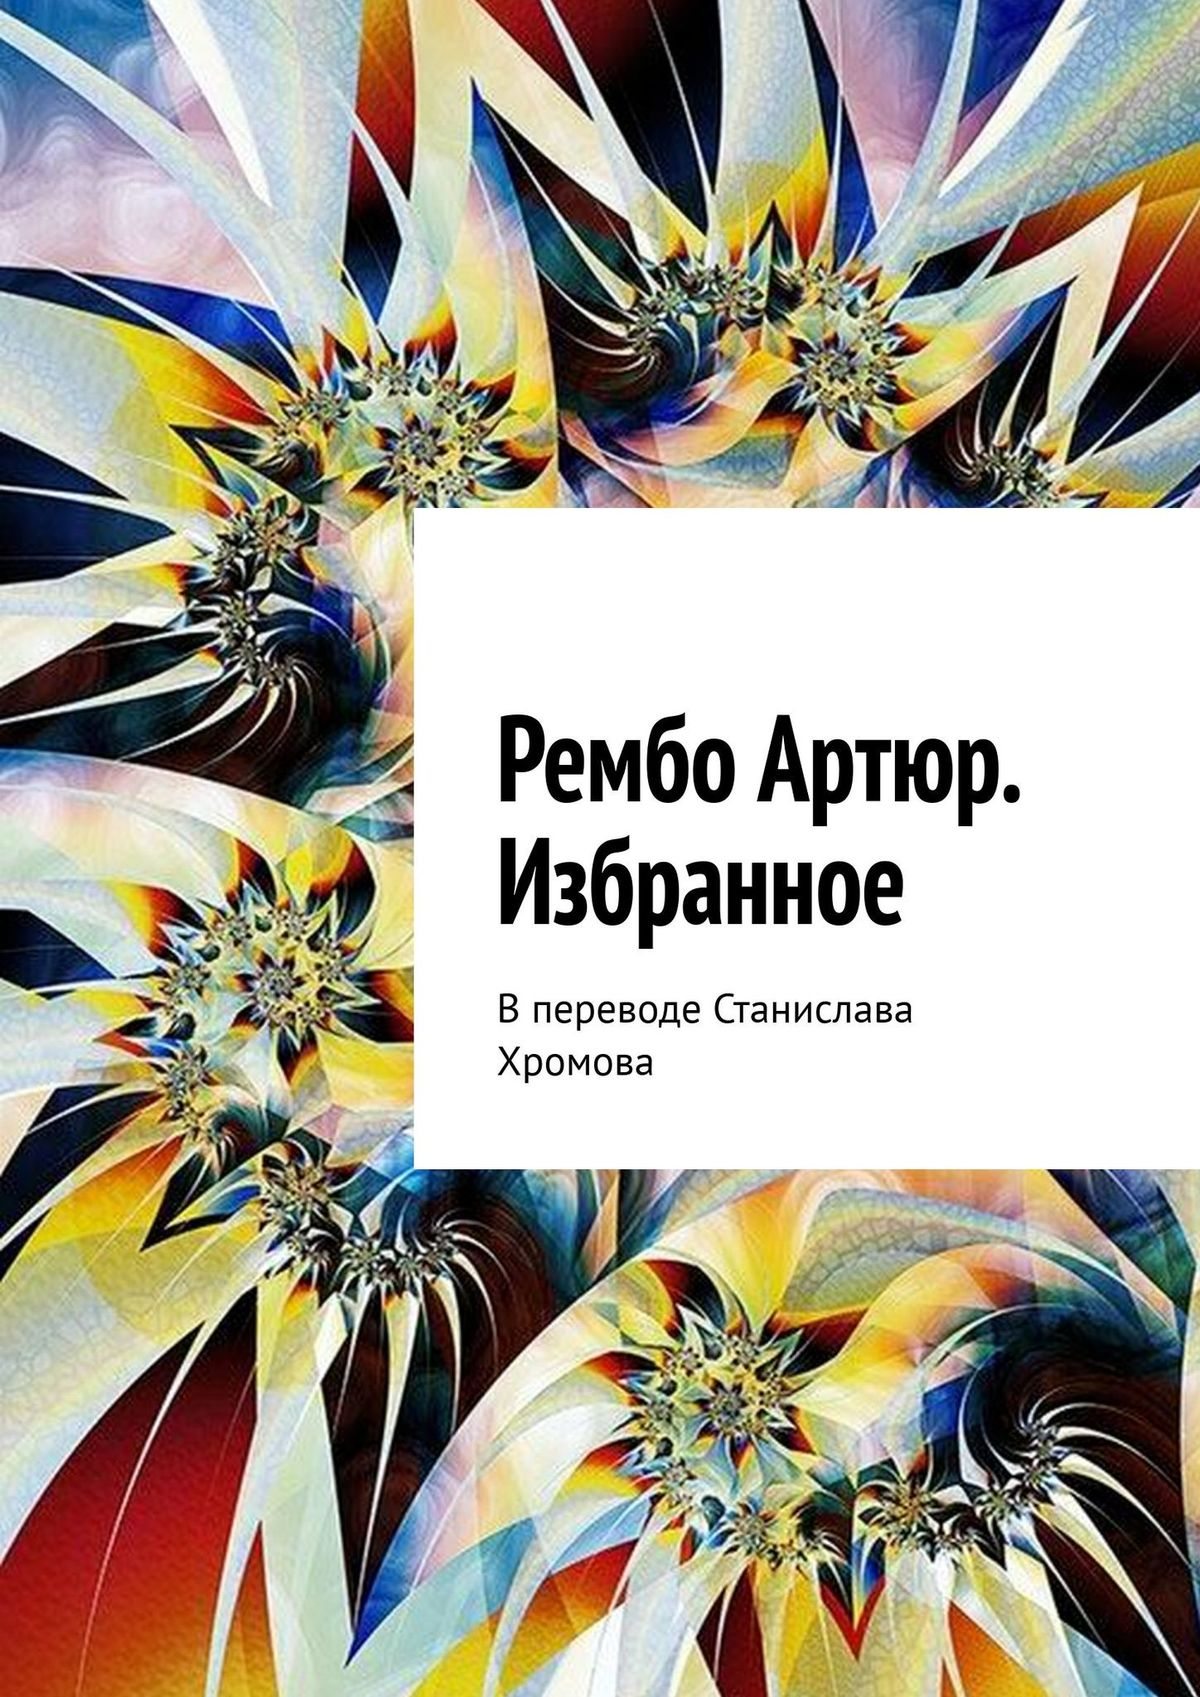 Артюр Рембо Избранное Впереводе Станислава Хромова